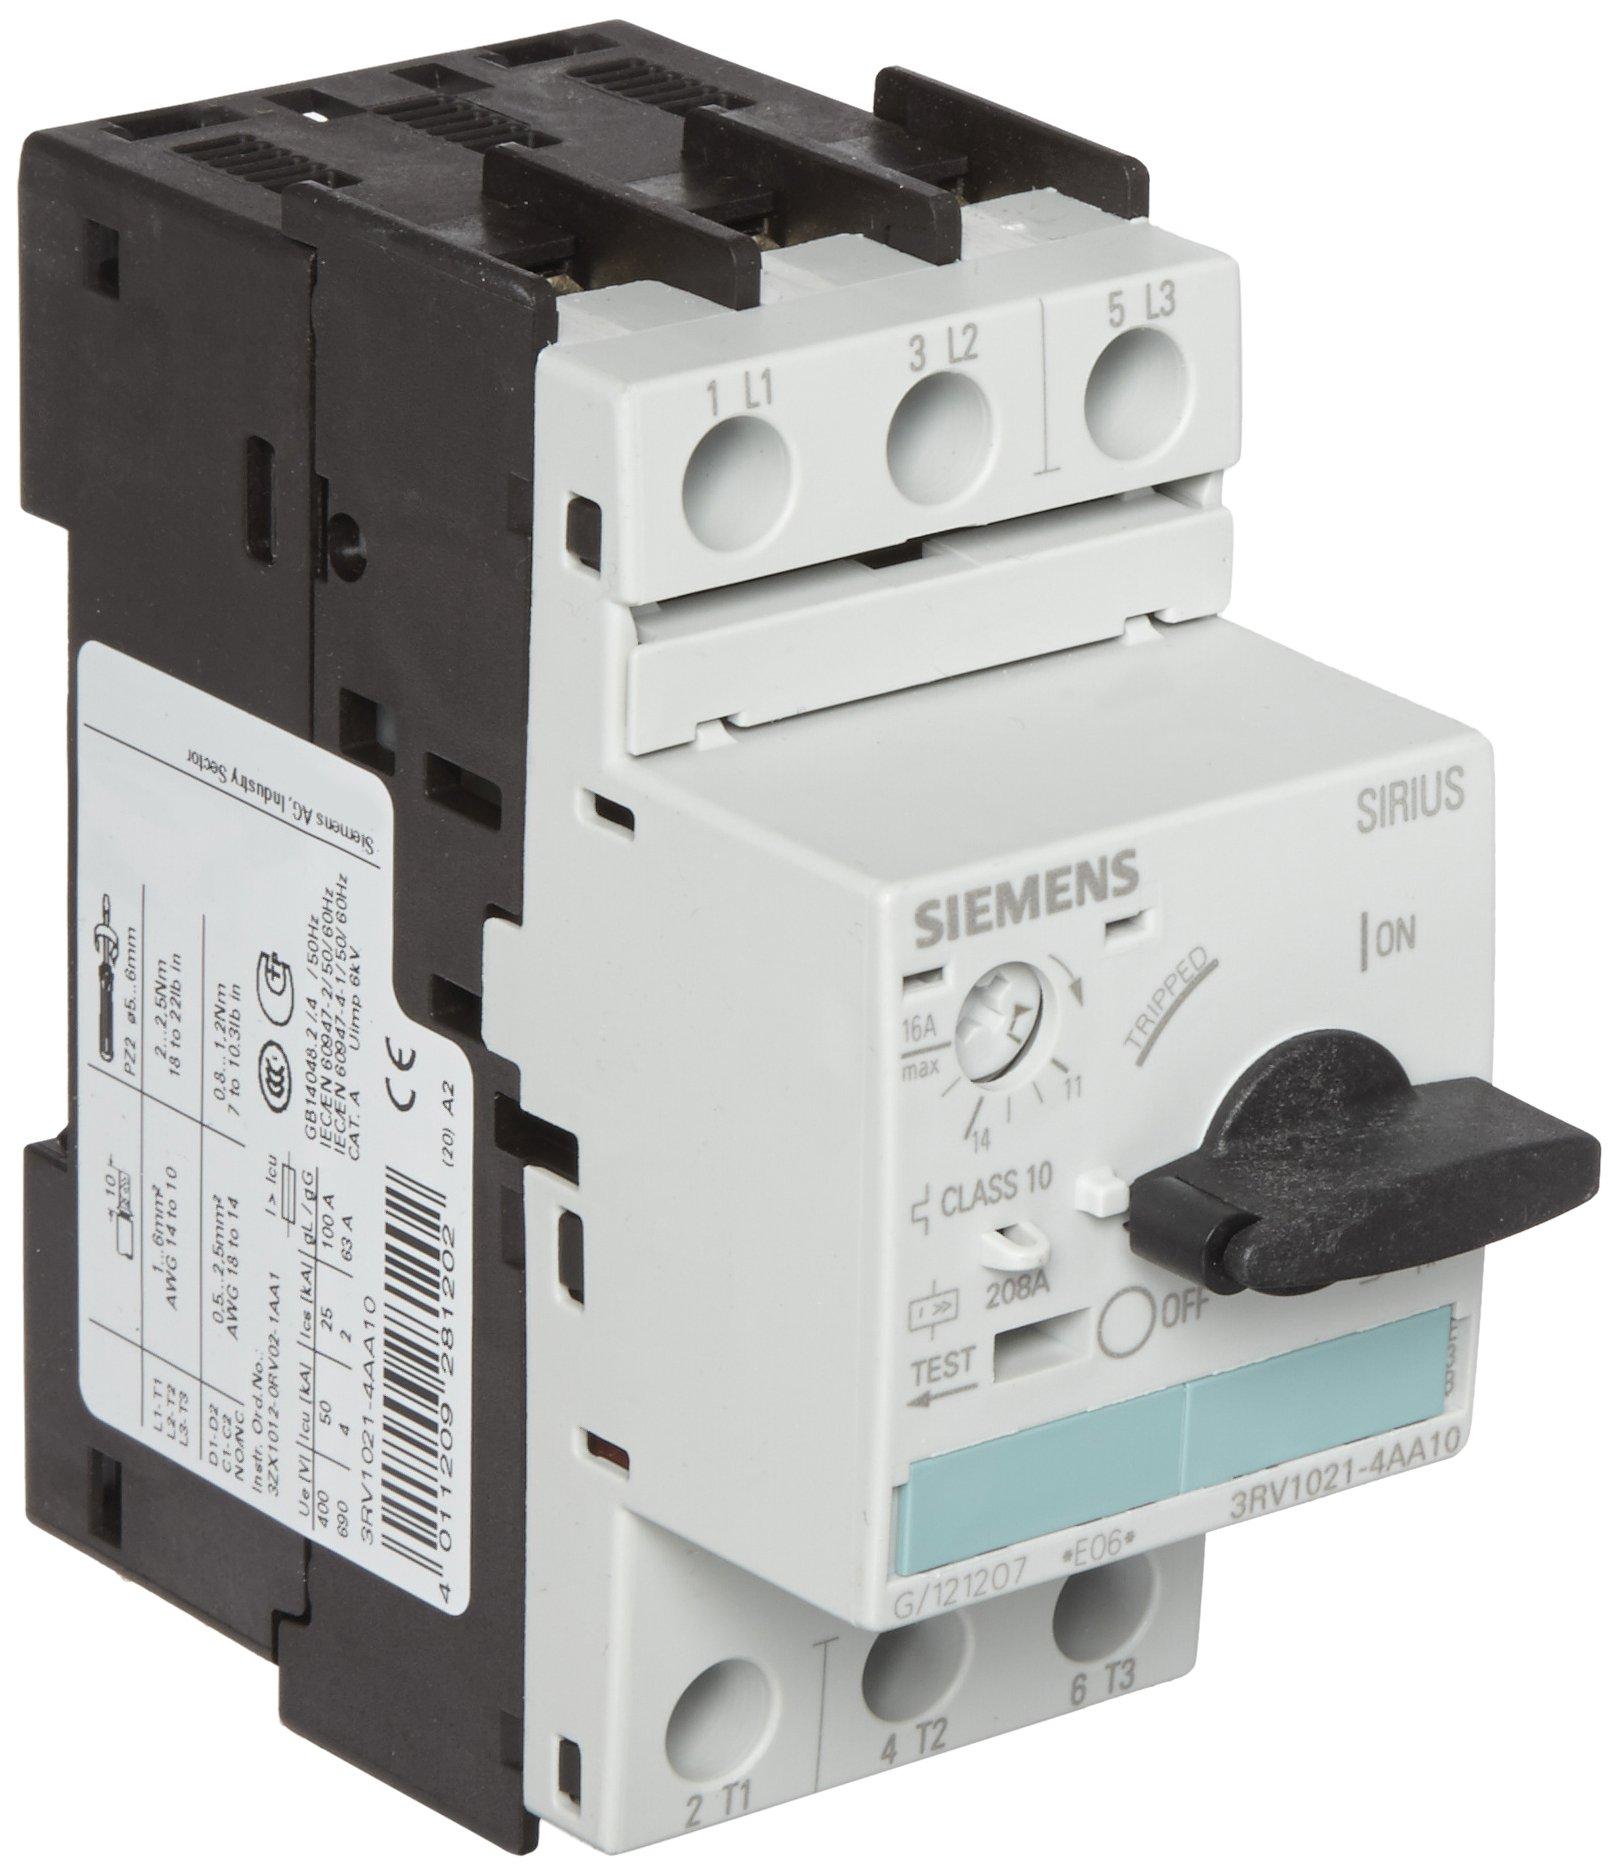 Siemens 3RV1021-4AA10 Motor Starter Protector, Screw Connection, 3RV102 Frame Size, 11-16 FLA Adjustment Range, 208A Instantaneous Short Circuit Release, 65kA UL Short Circuit Breaking Capacity at 480VAC